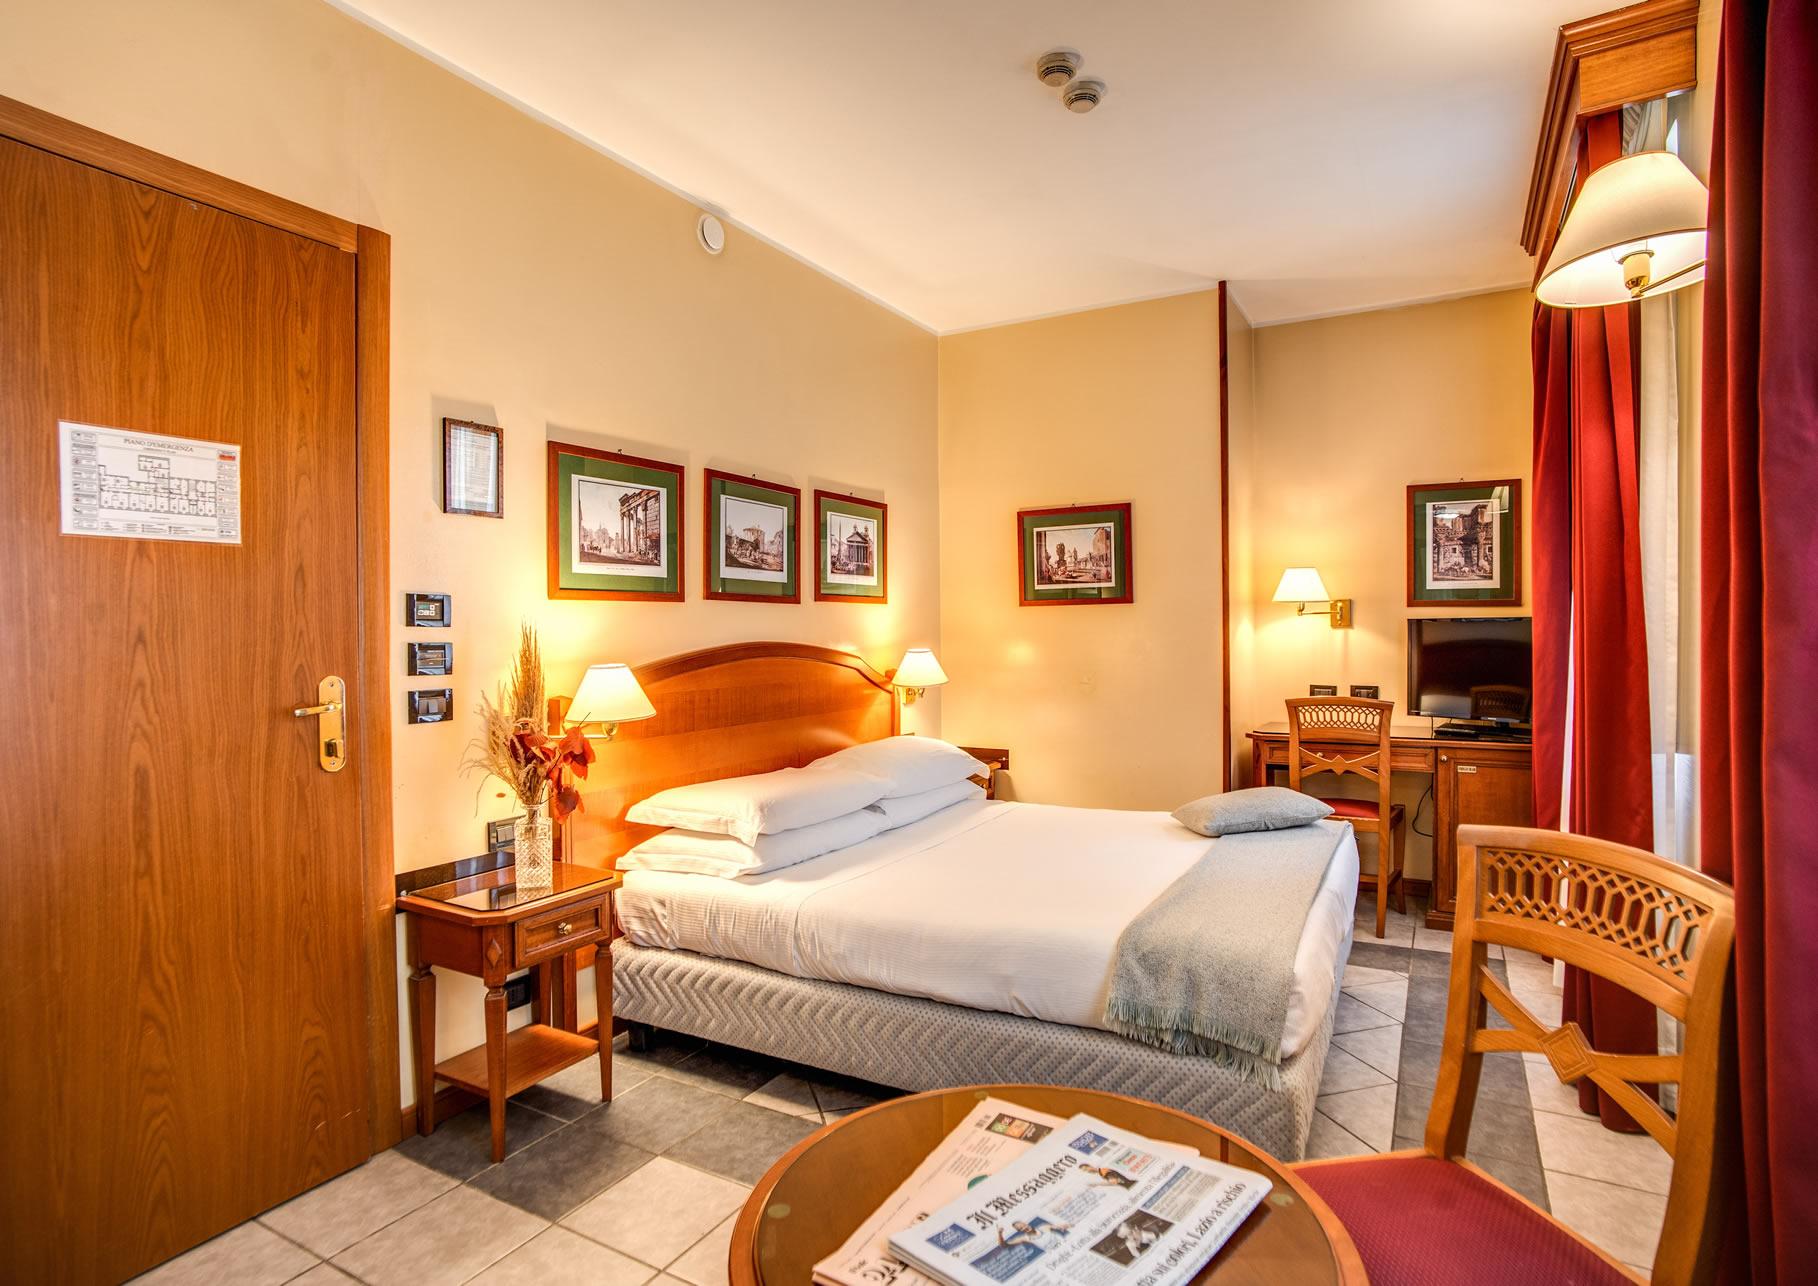 hotel milani rom offizieller internetauftritt preiswertes hotel in rom. Black Bedroom Furniture Sets. Home Design Ideas